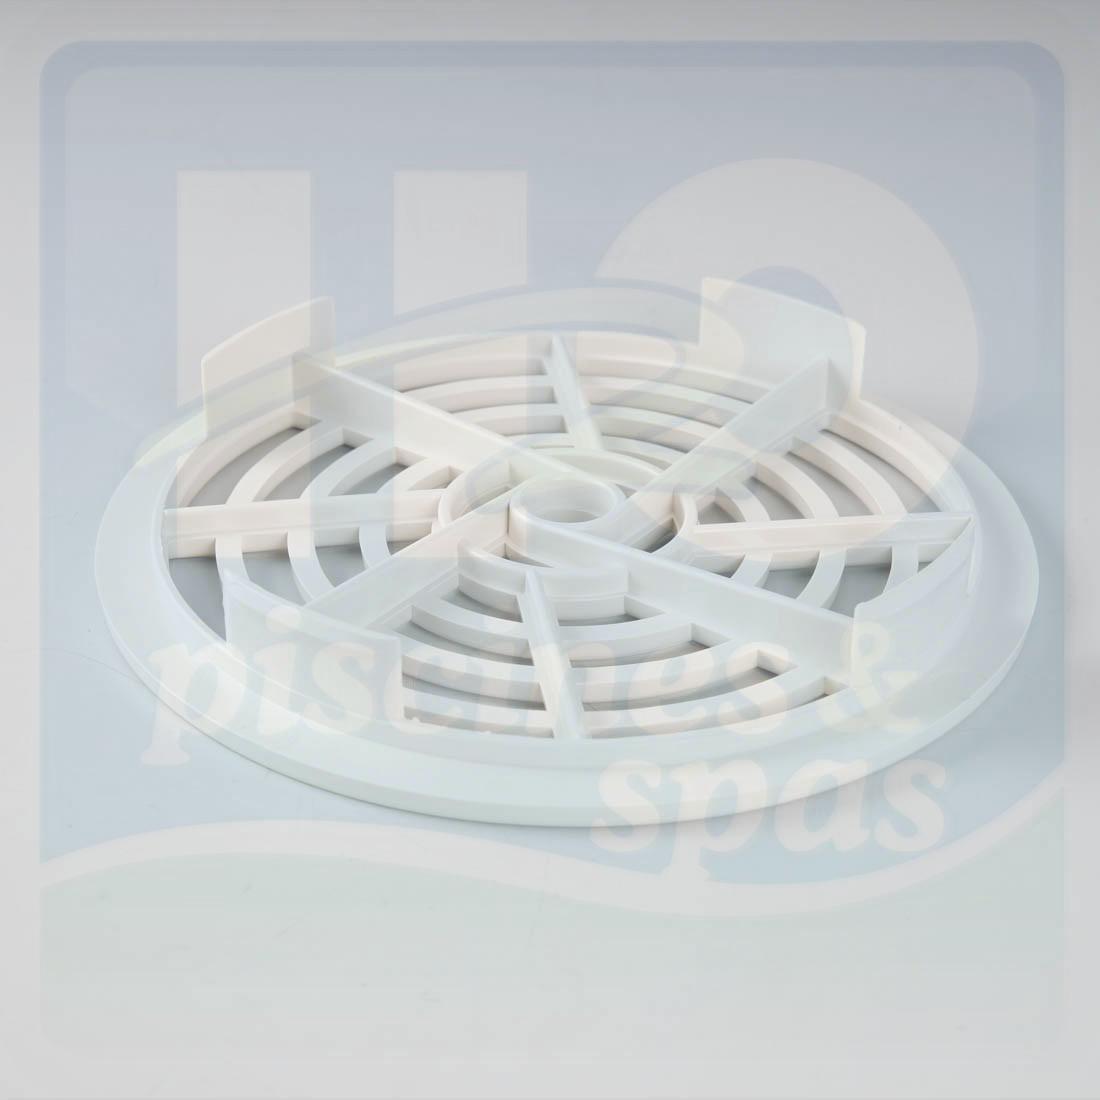 grille de bonde de fond b ton snte h2o piscines spas. Black Bedroom Furniture Sets. Home Design Ideas